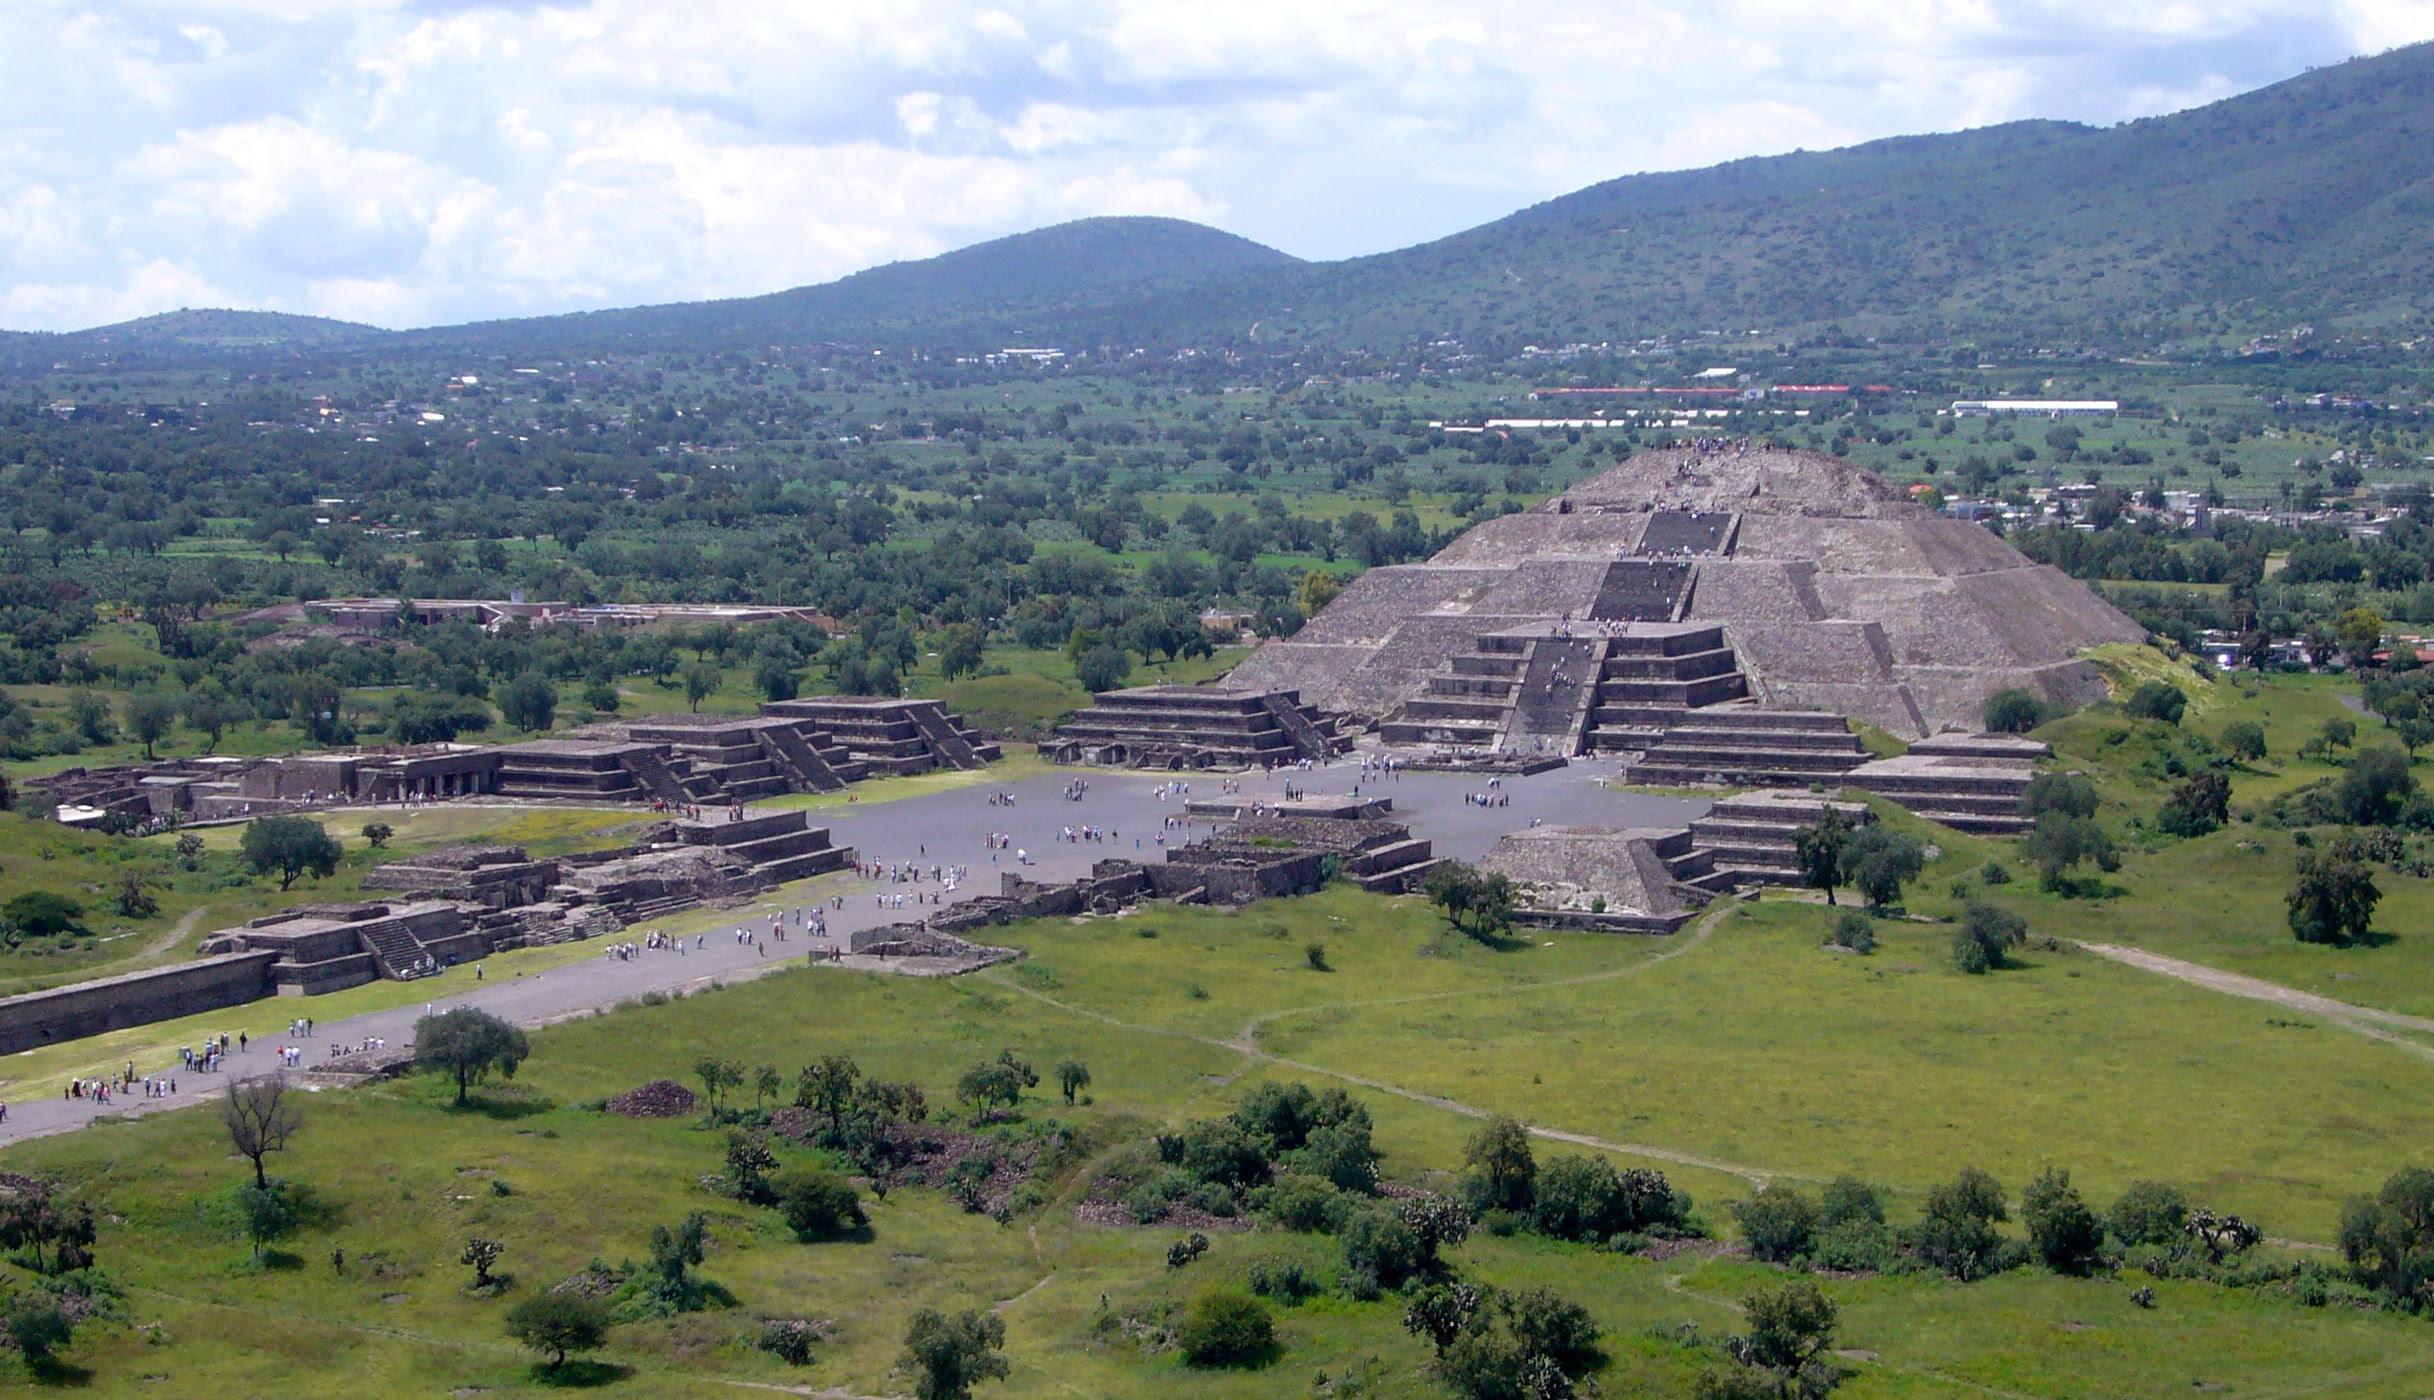 http://upload.wikimedia.org/wikipedia/commons/a/a1/Piramide_de_la_Luna_072006.jpg